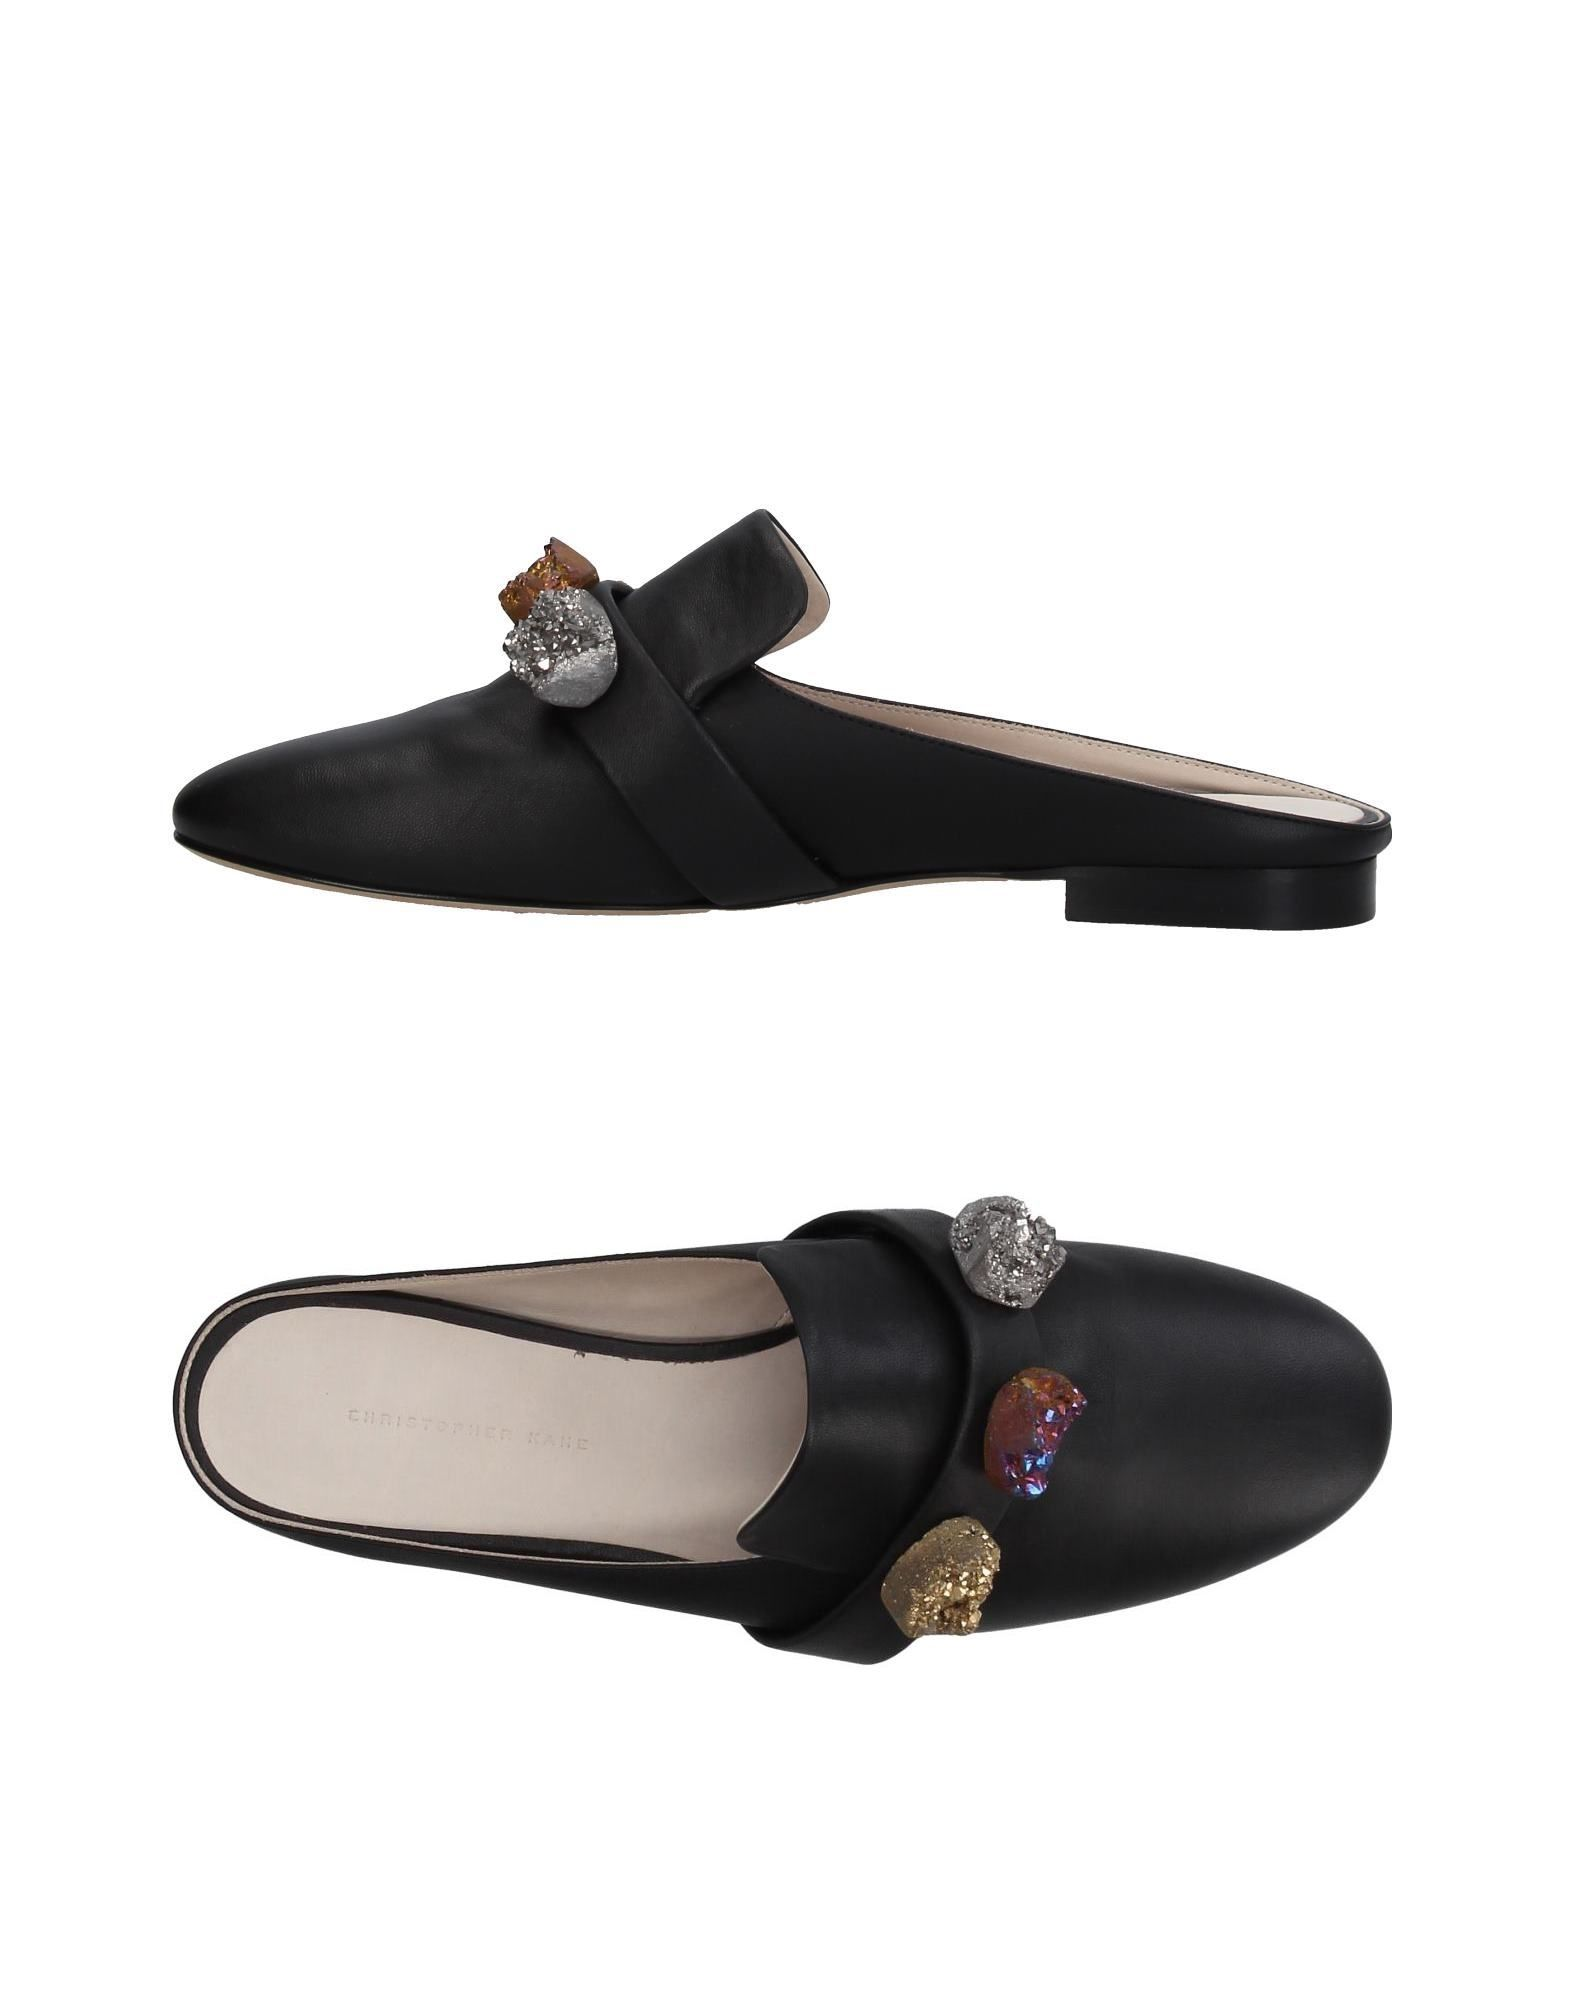 Christopher Kane Pantoletten Damen  11398764PBGut aussehende strapazierfähige Schuhe